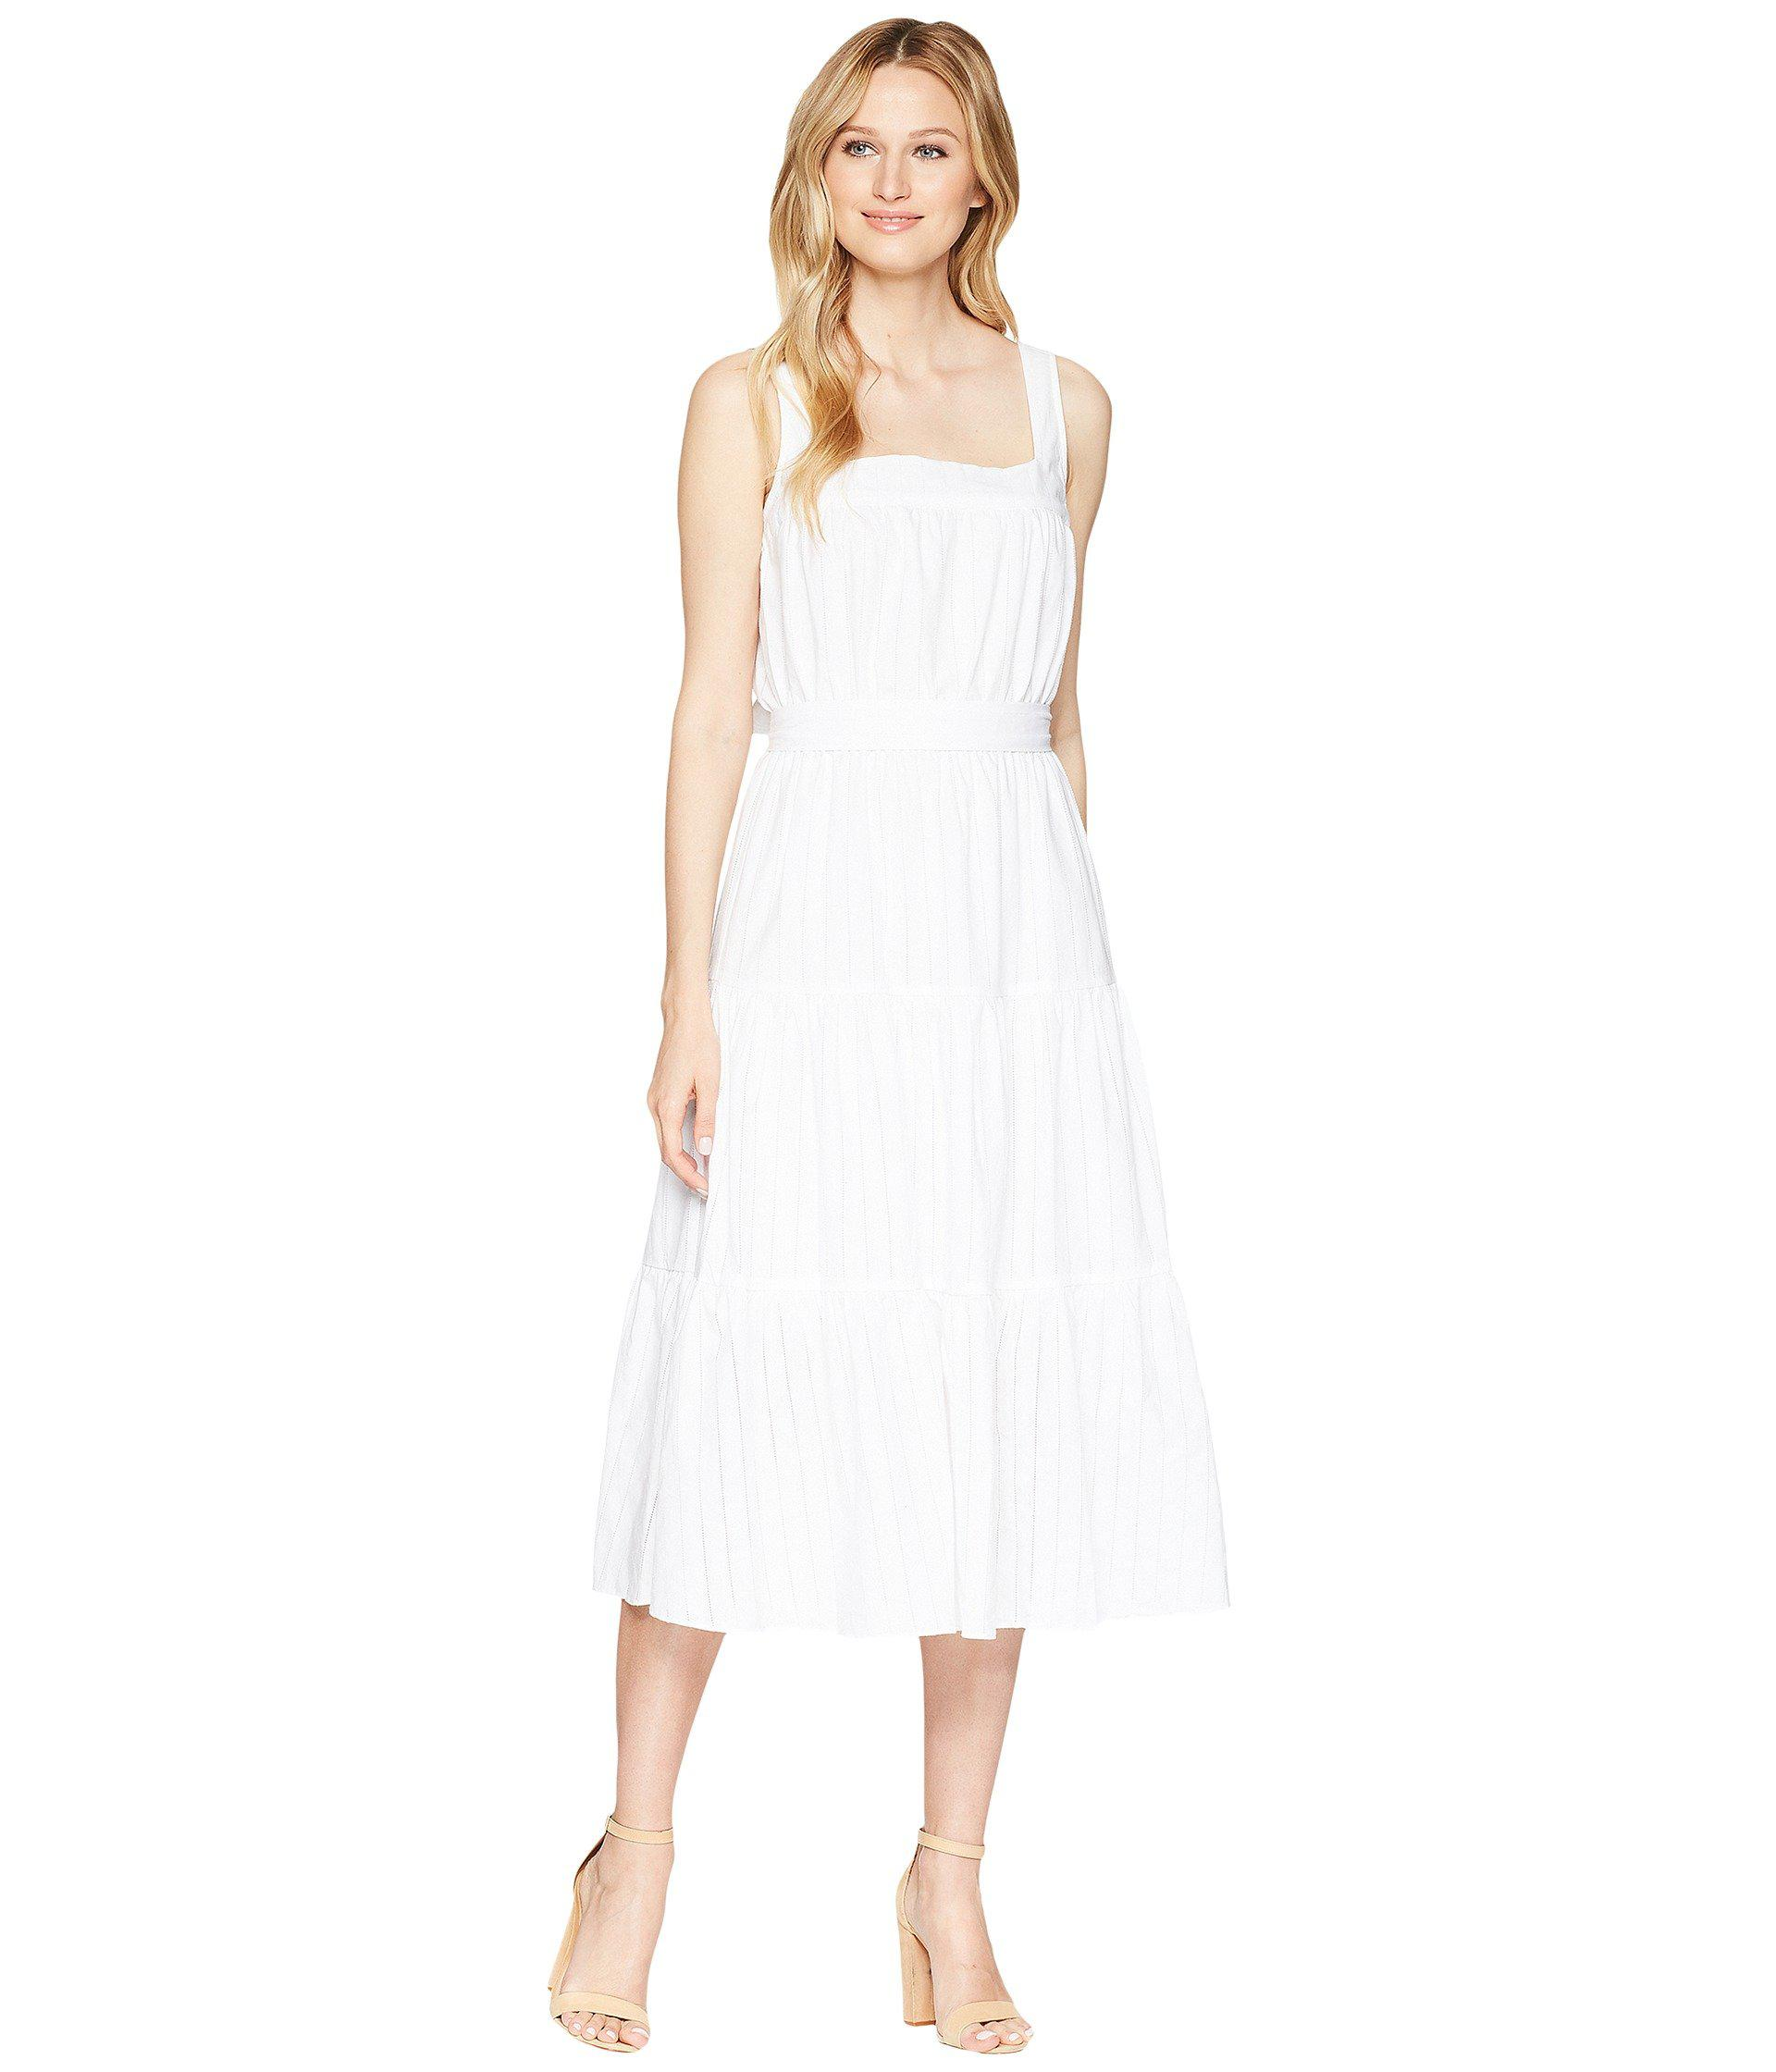 0ffb024e2dc Lyst - MICHAEL Michael Kors Tiered Midi Dress in White - Save 9%